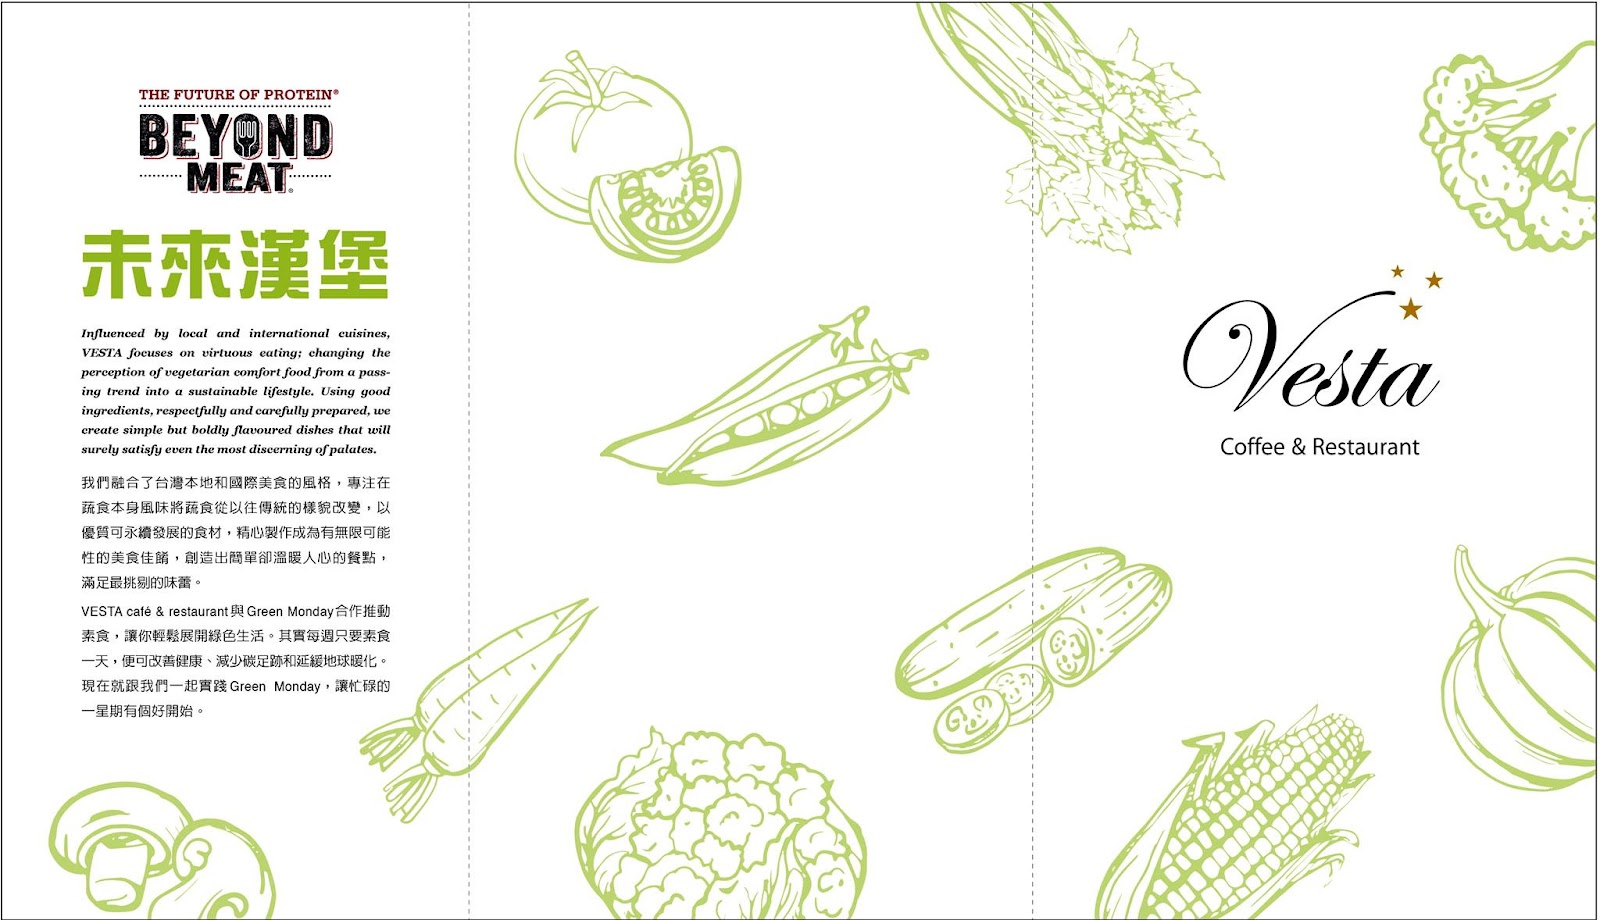 VESTA coffee and restaurant 菜單